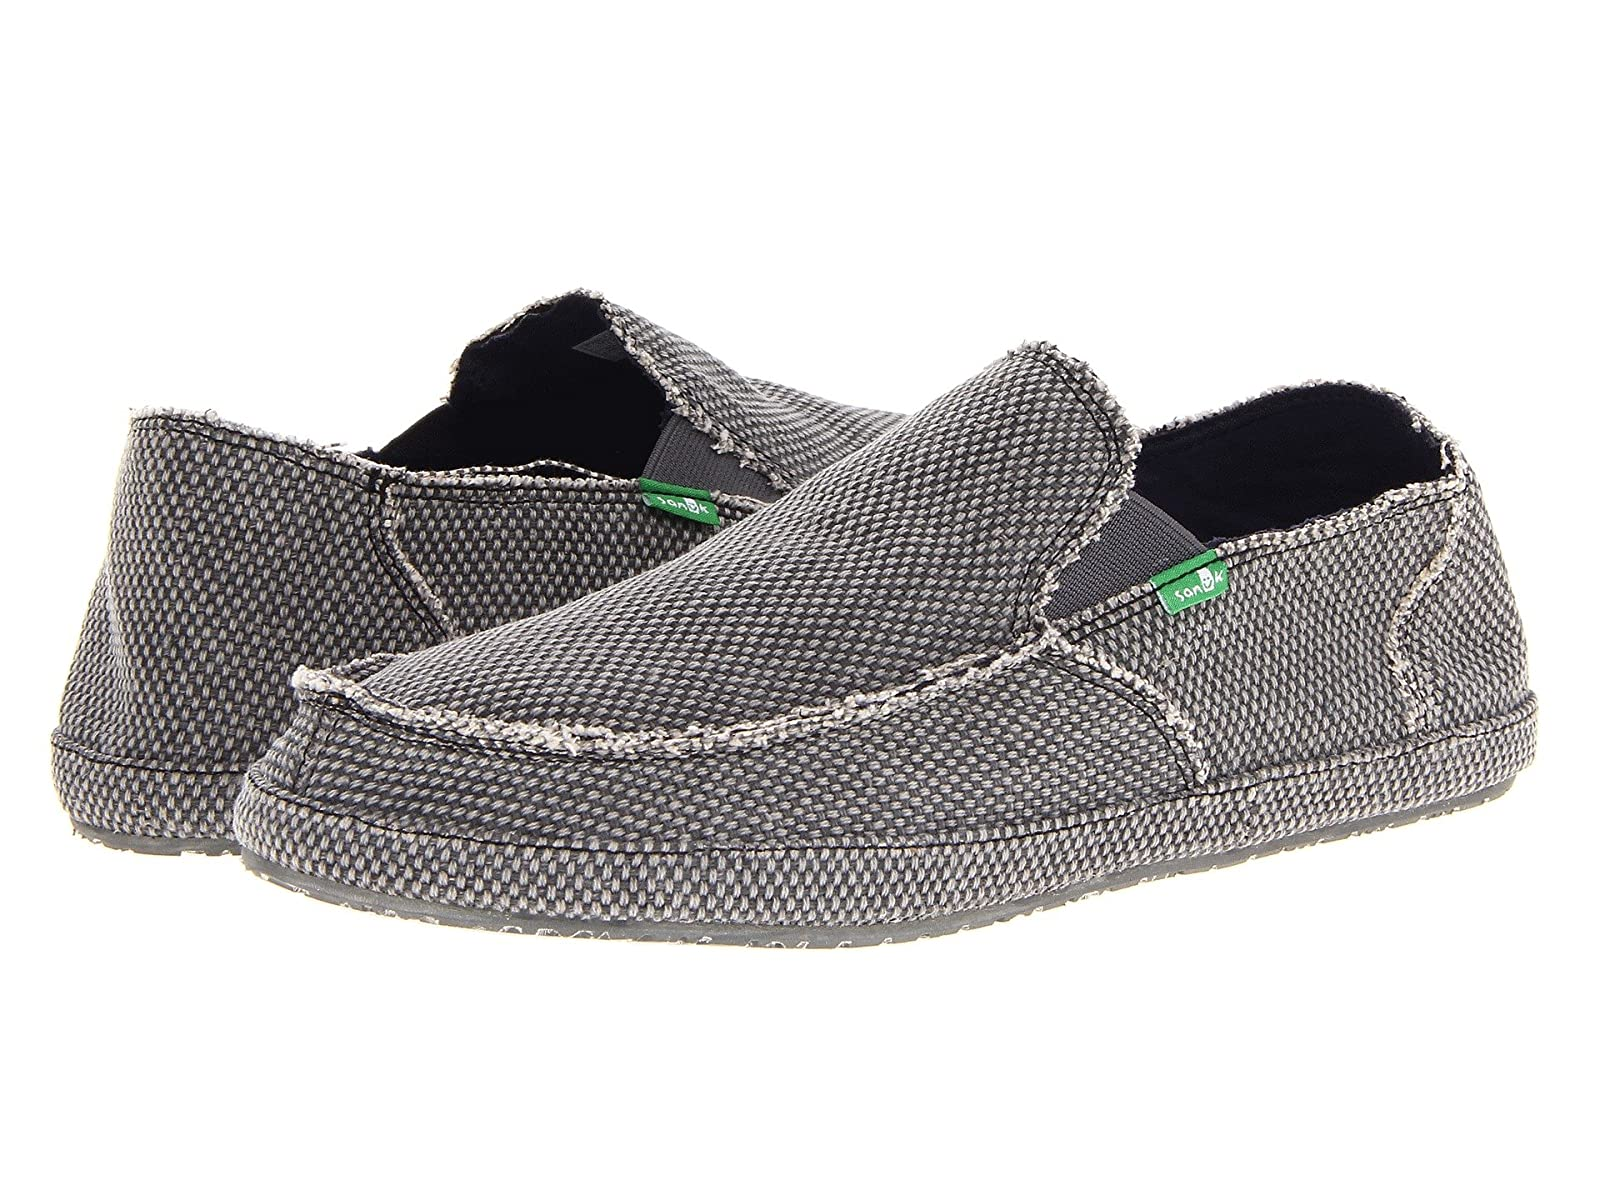 Sanuk RounderAtmospheric grades have affordable shoes